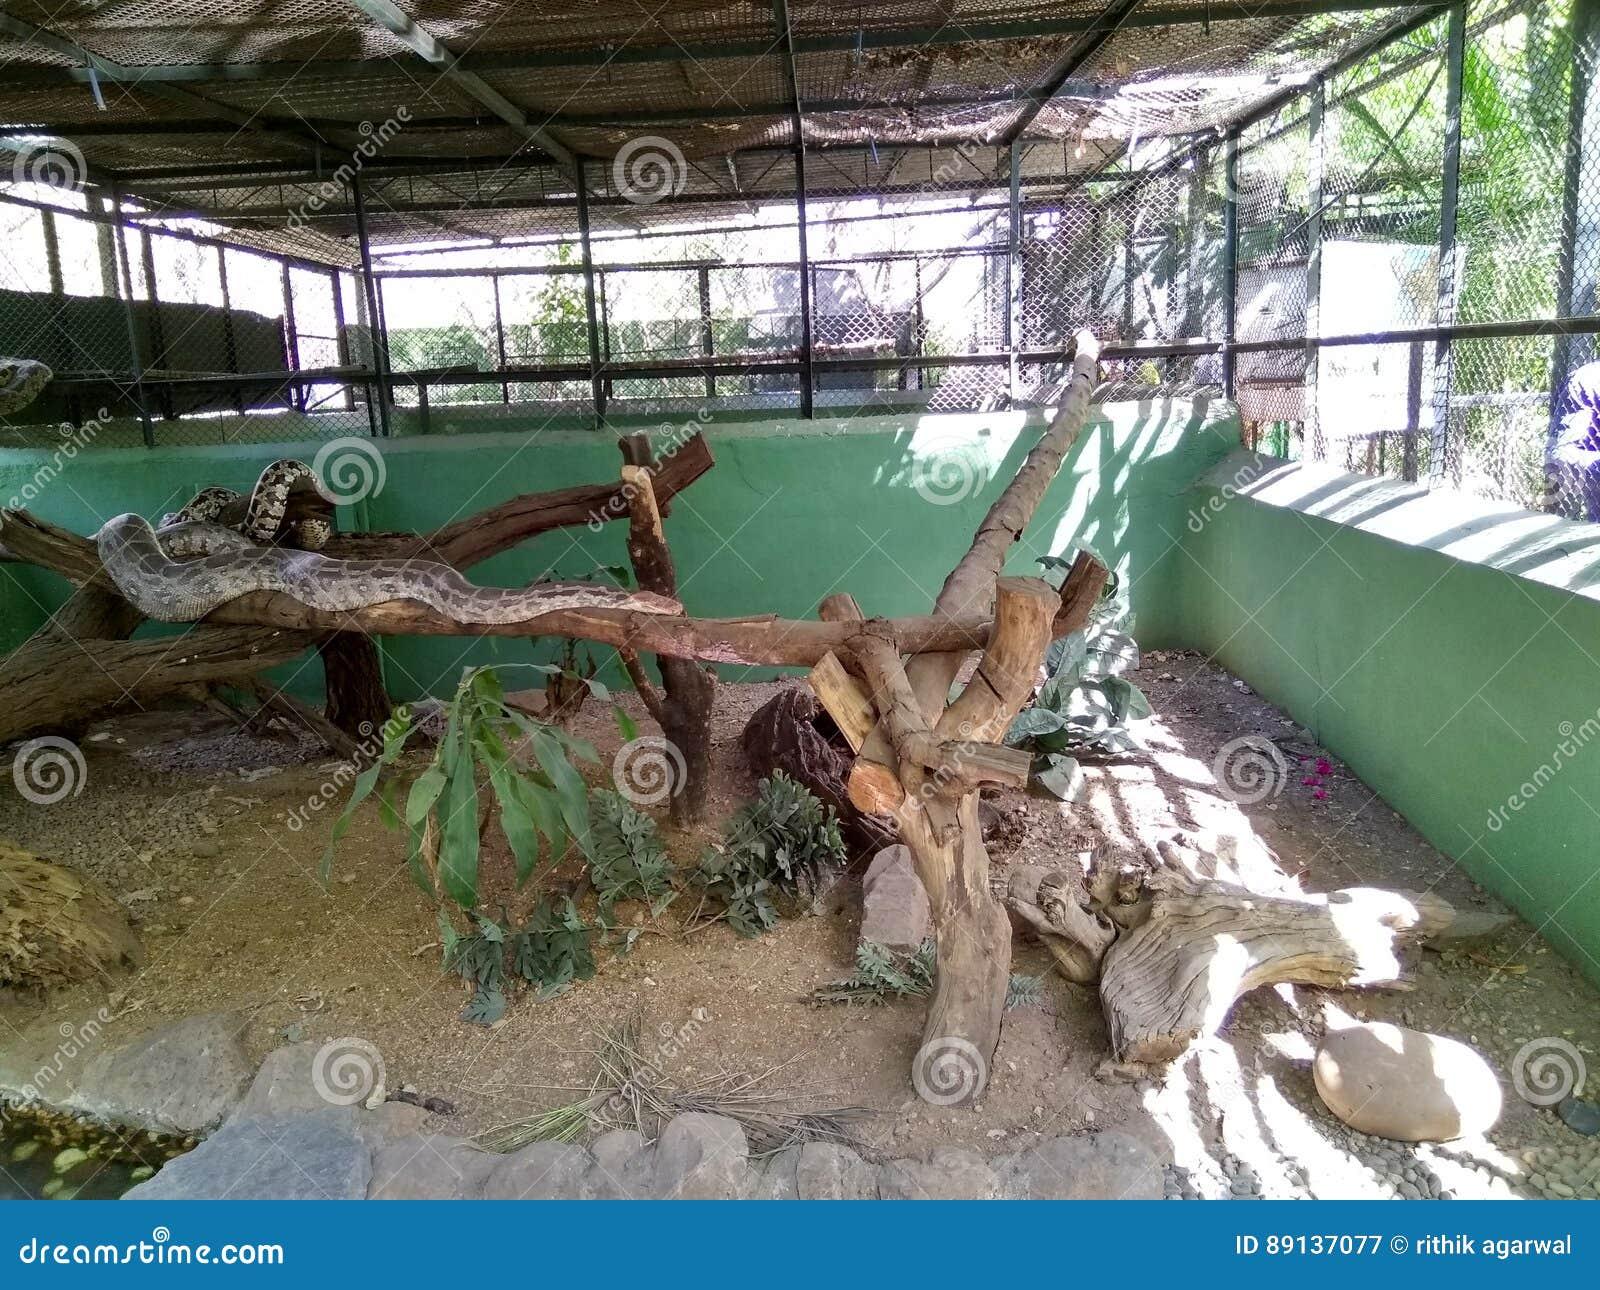 katraj zoo images